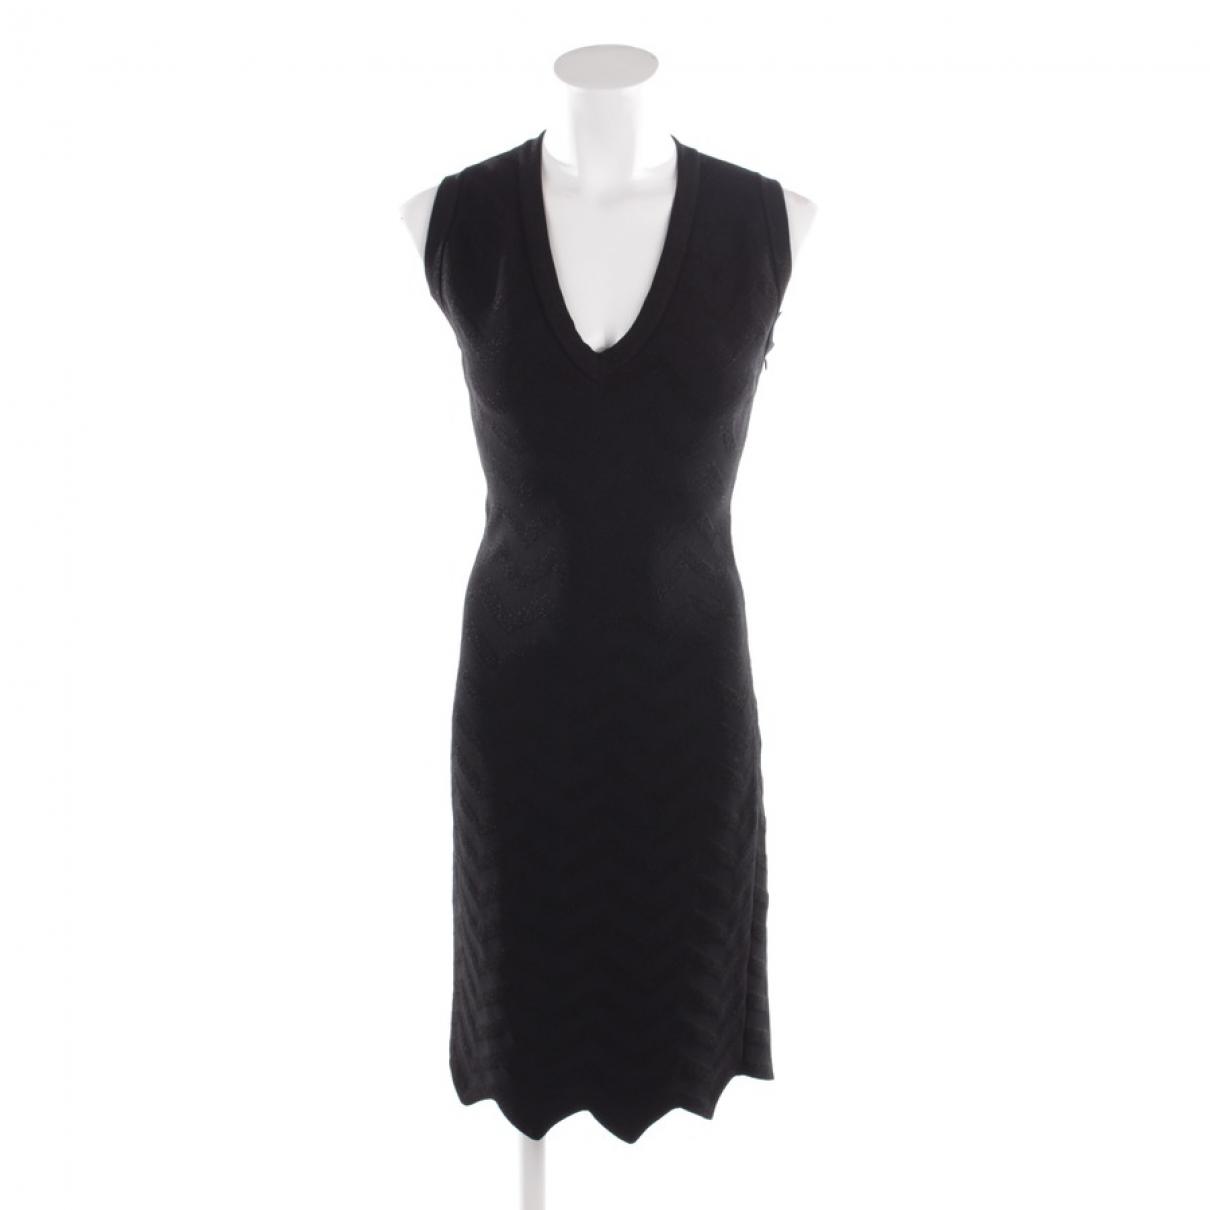 Alaïa \N Black dress for Women 34 FR